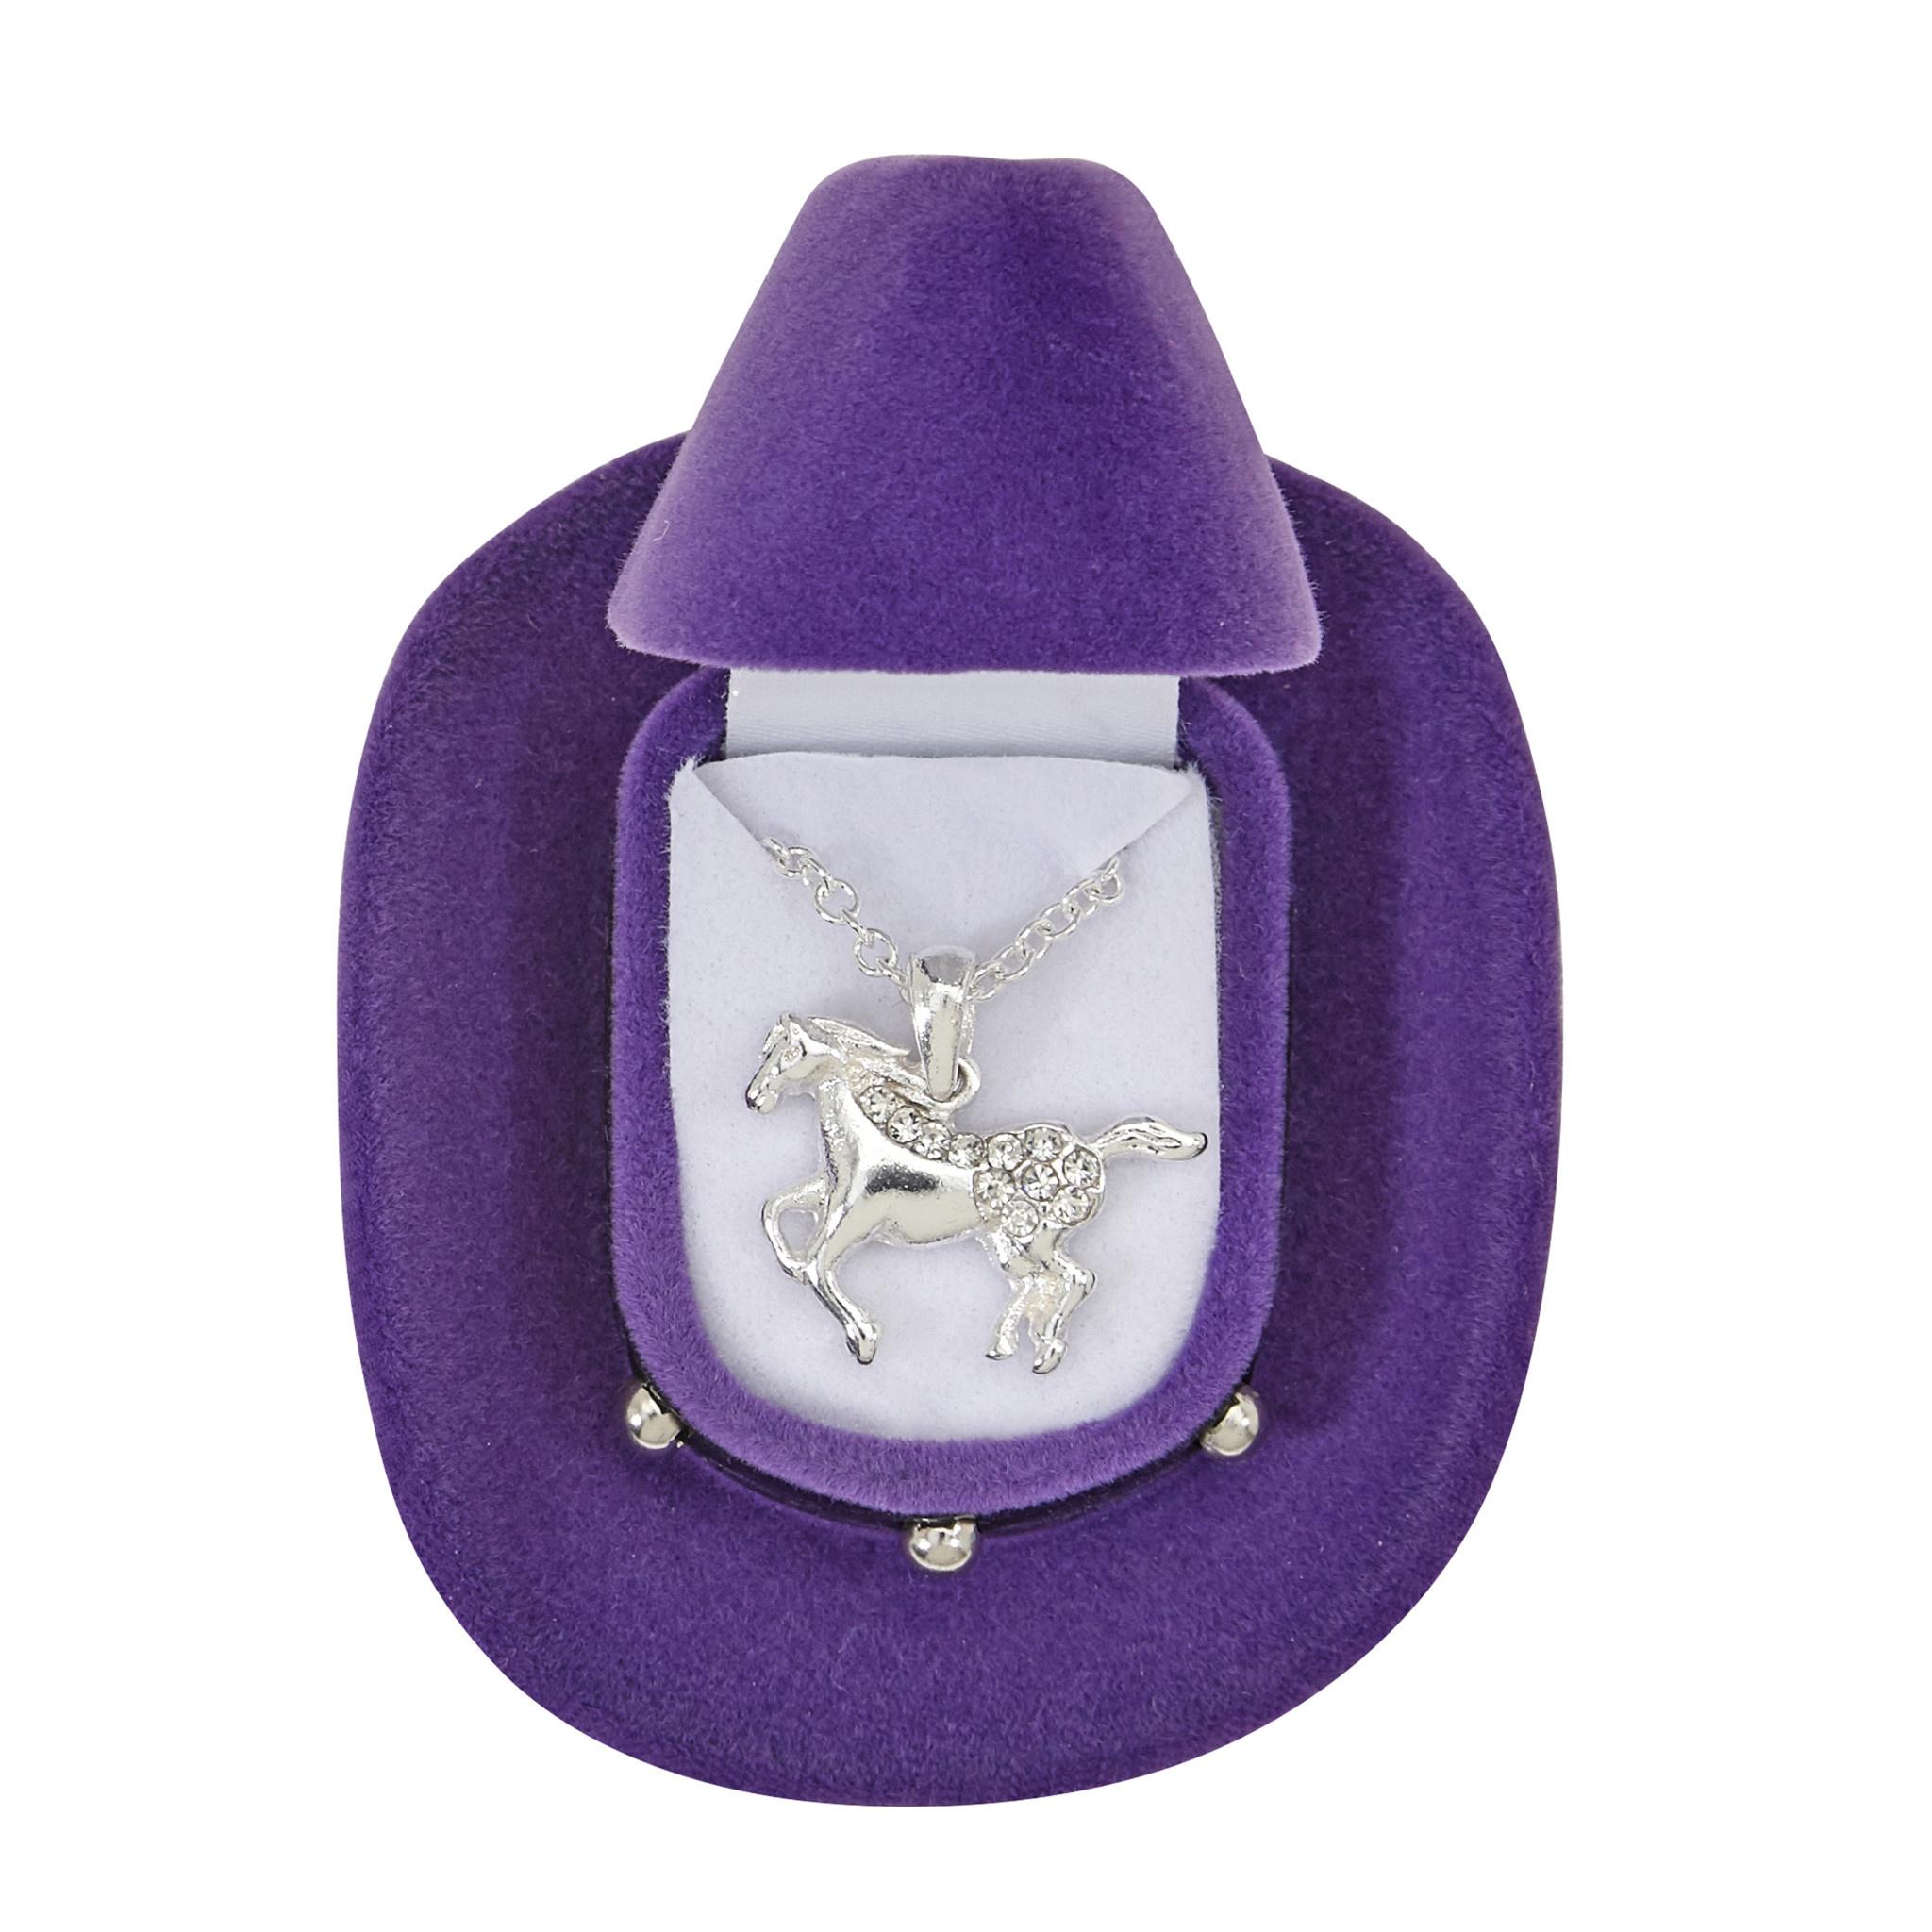 AWST AWST Gallopng Horse Necklace